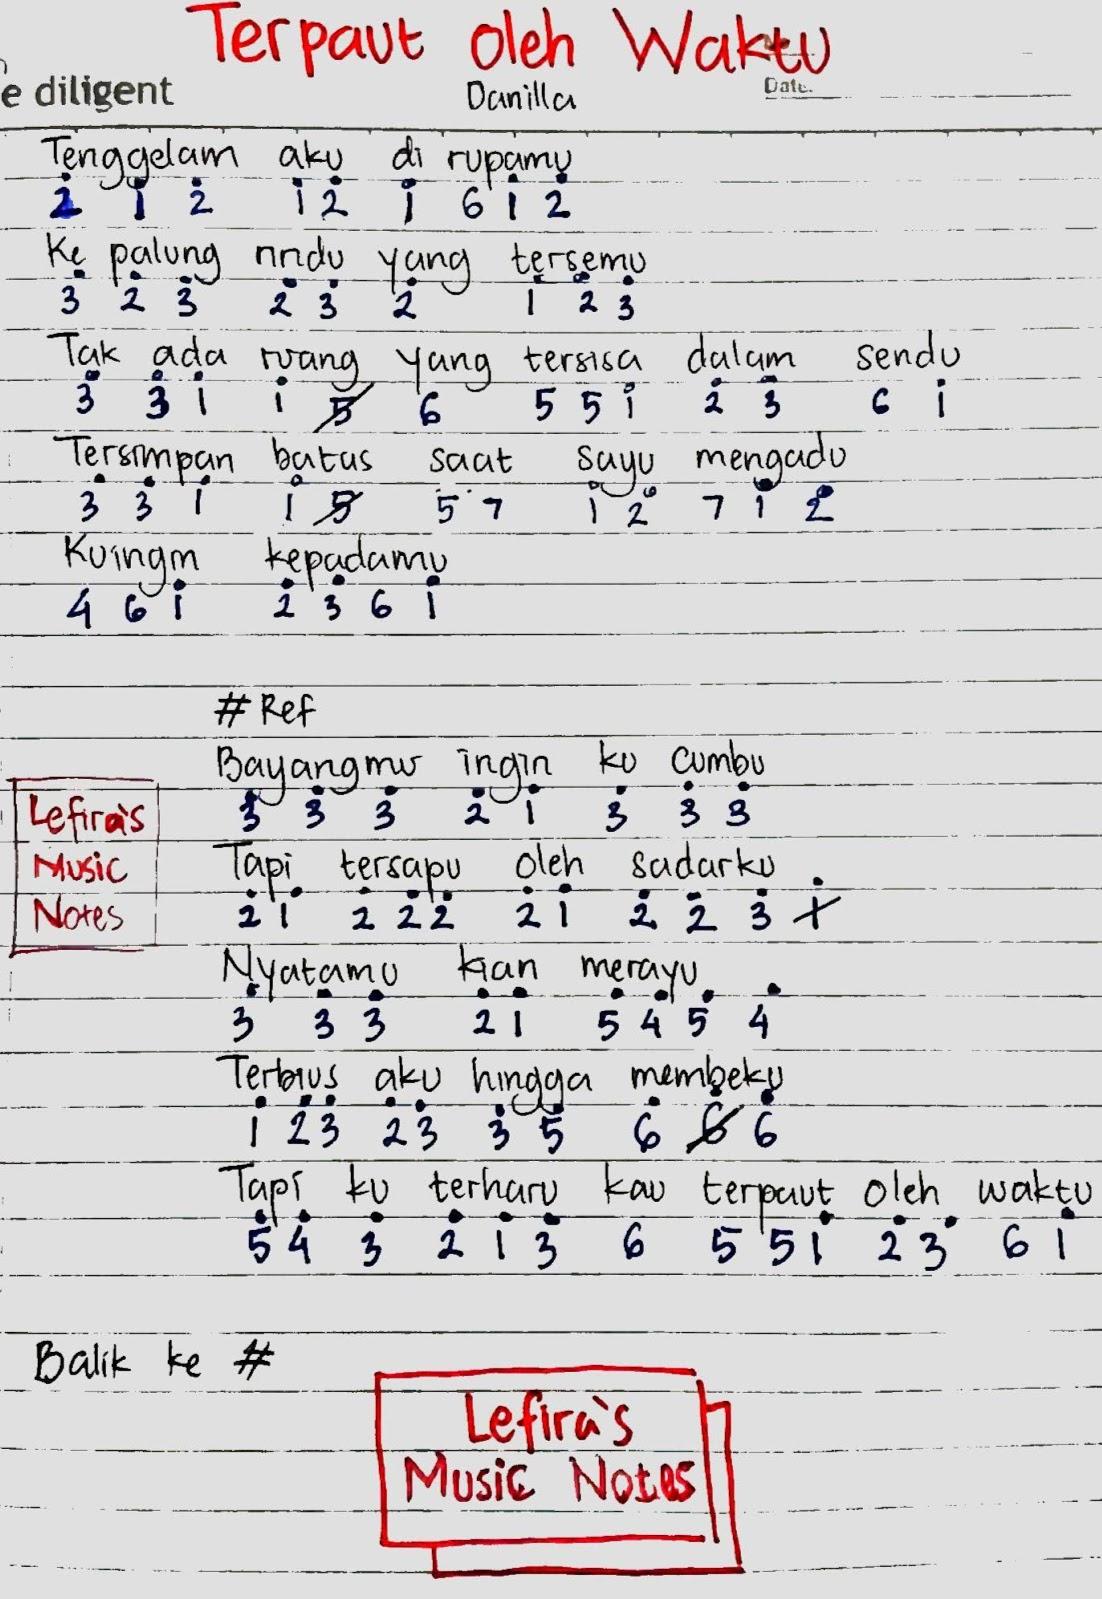 Chord Berdistraksi : chord, berdistraksi, Angka, Danilla, Terpaut, Waktu